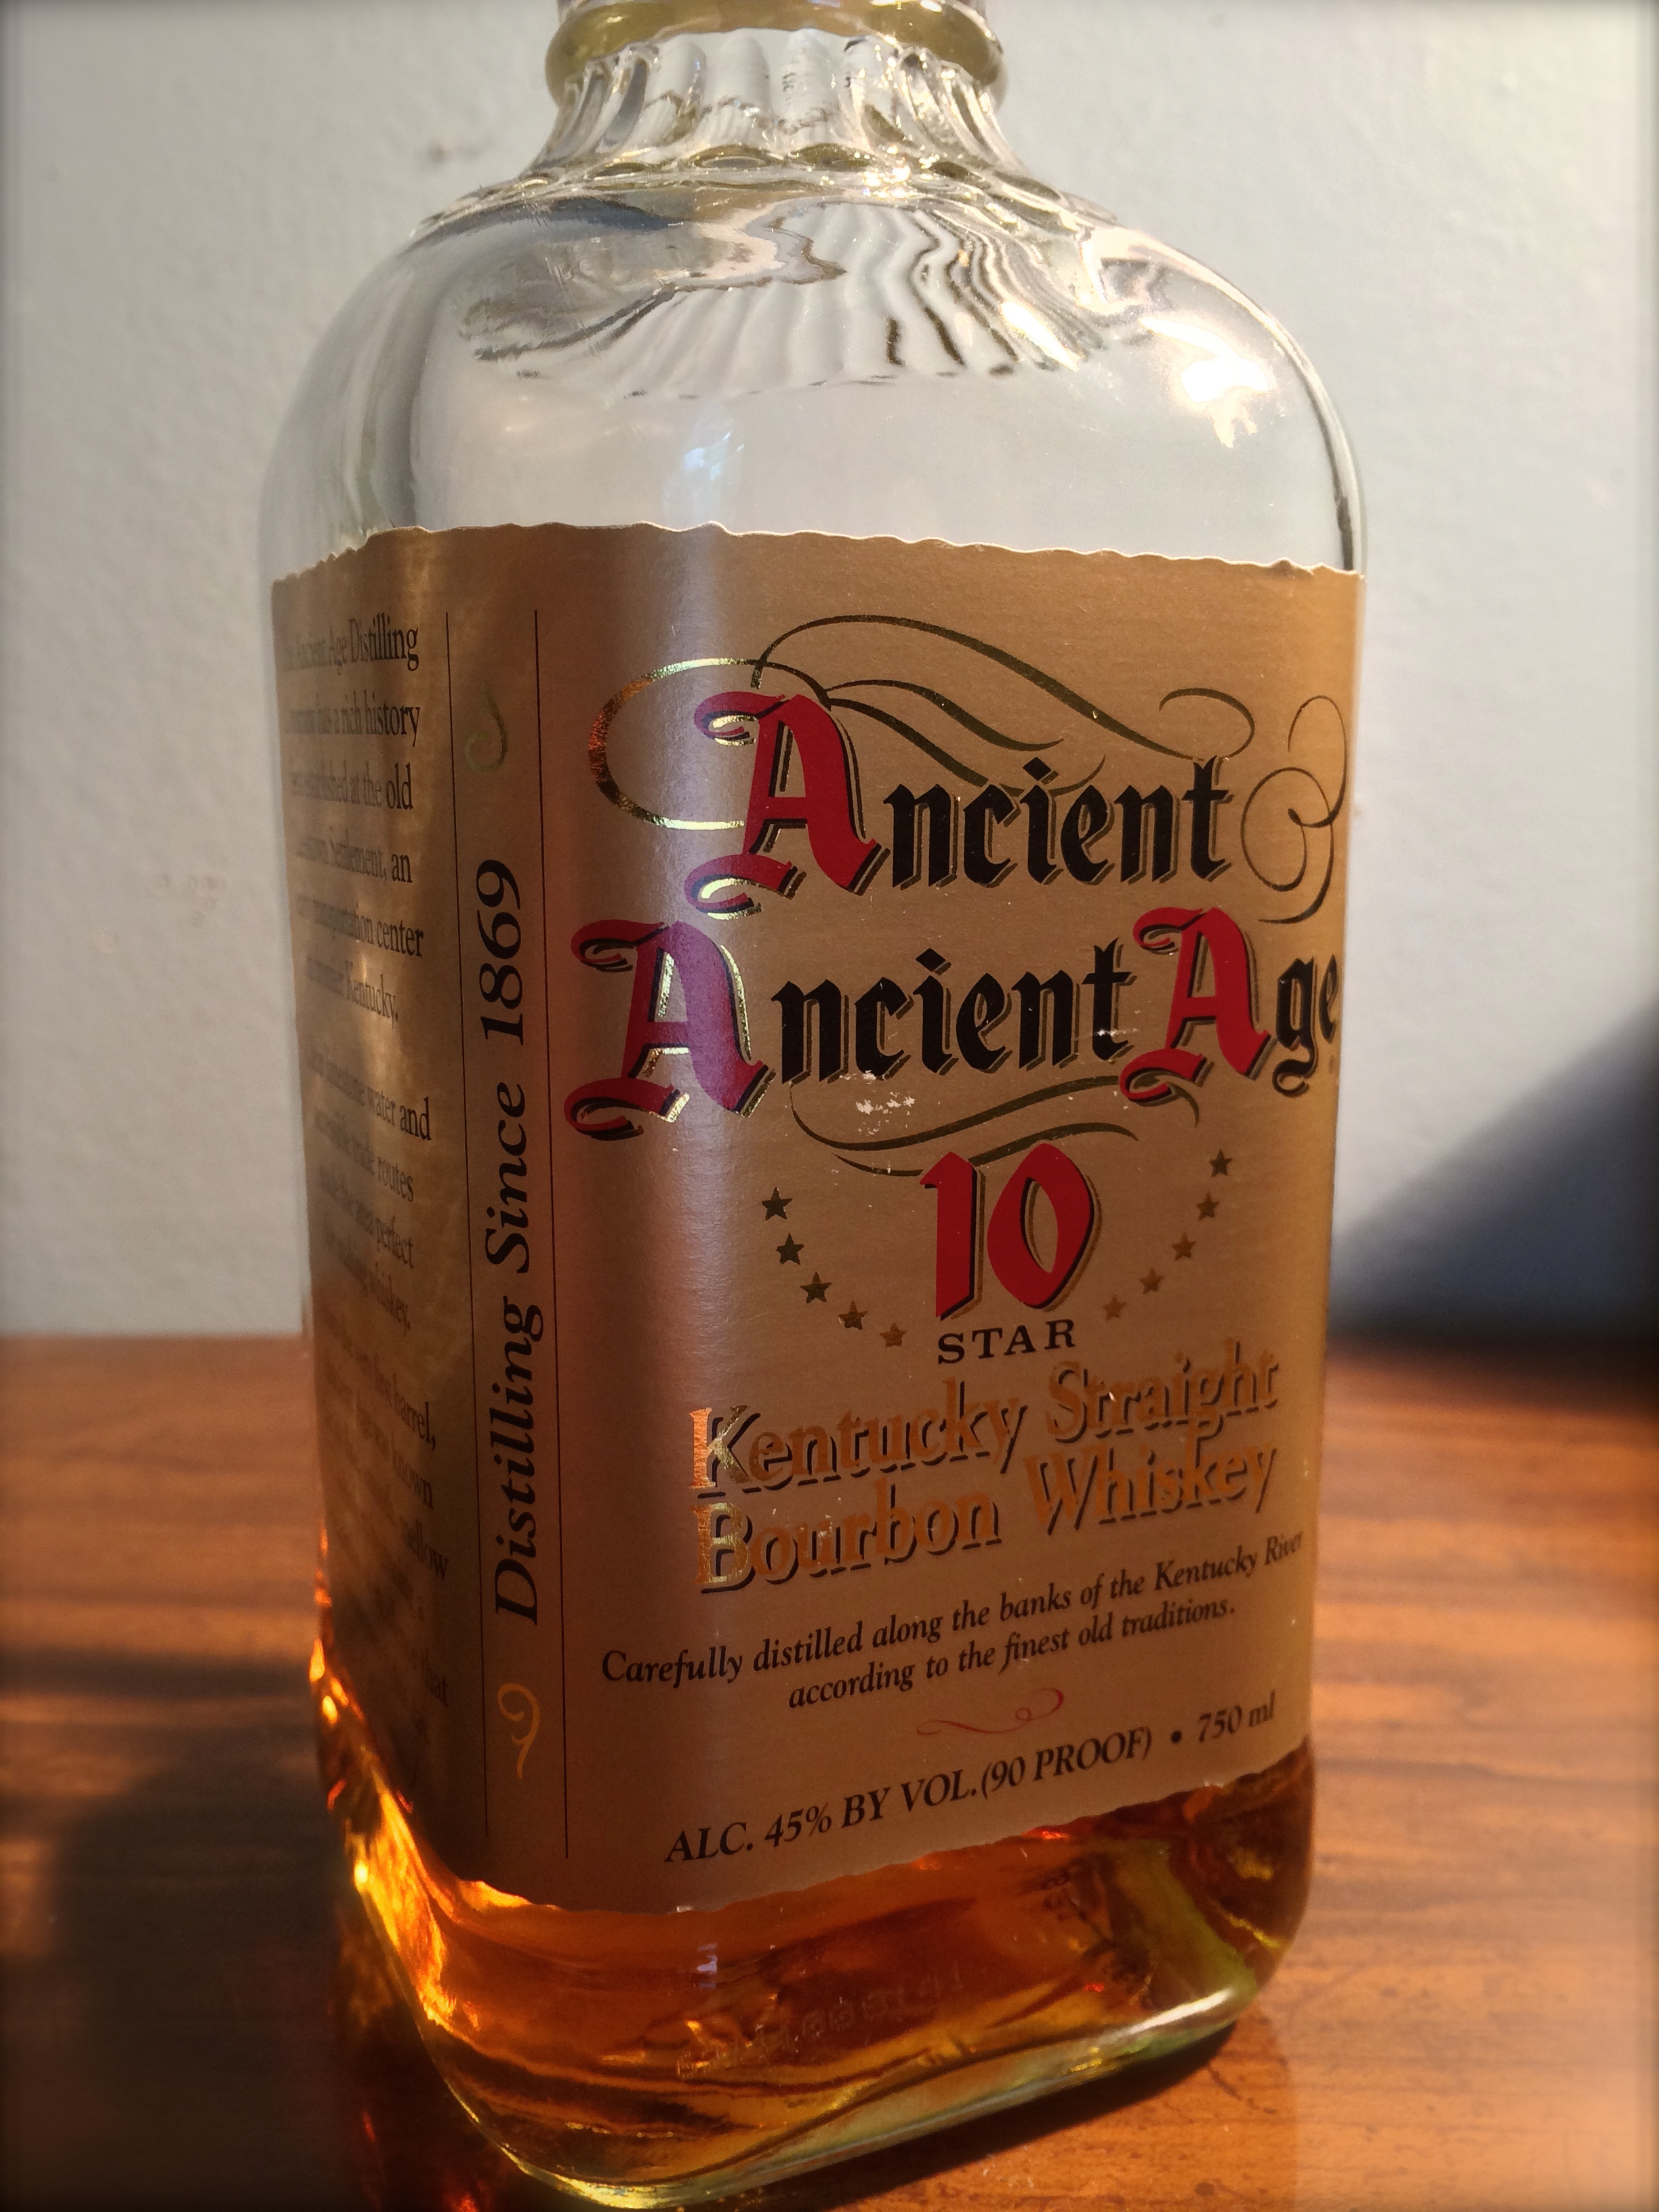 a1dccc98deb Ancient Ancient Age 10 Star Review